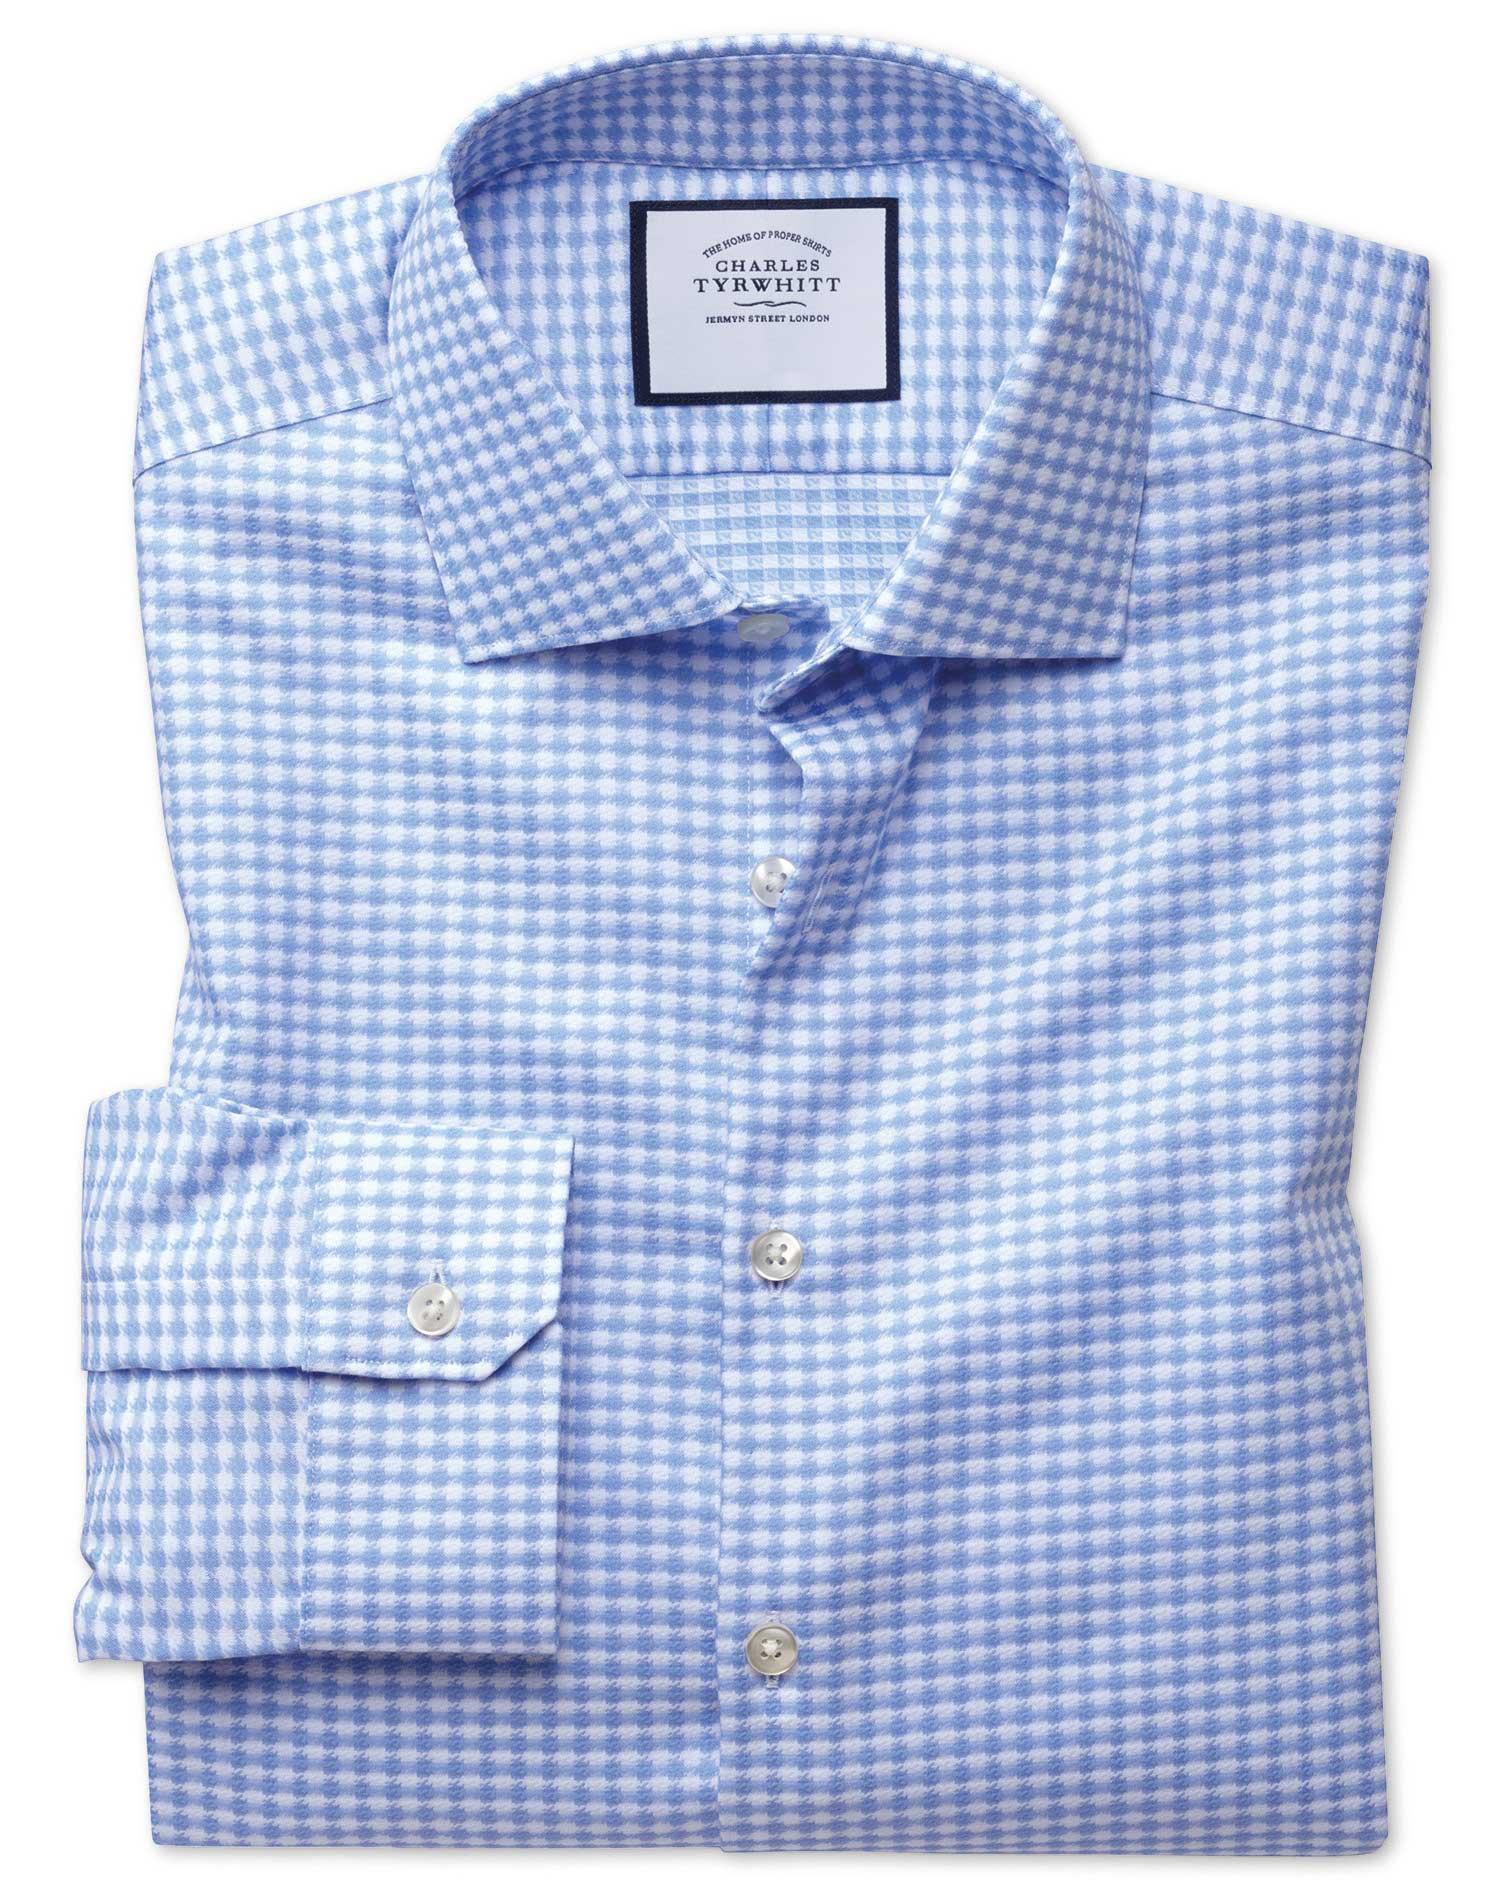 Super Slim Fit Semi-Cutaway Business Casual Non-Iron Modern Textures Sky Blue Cotton Formal Shirt Si